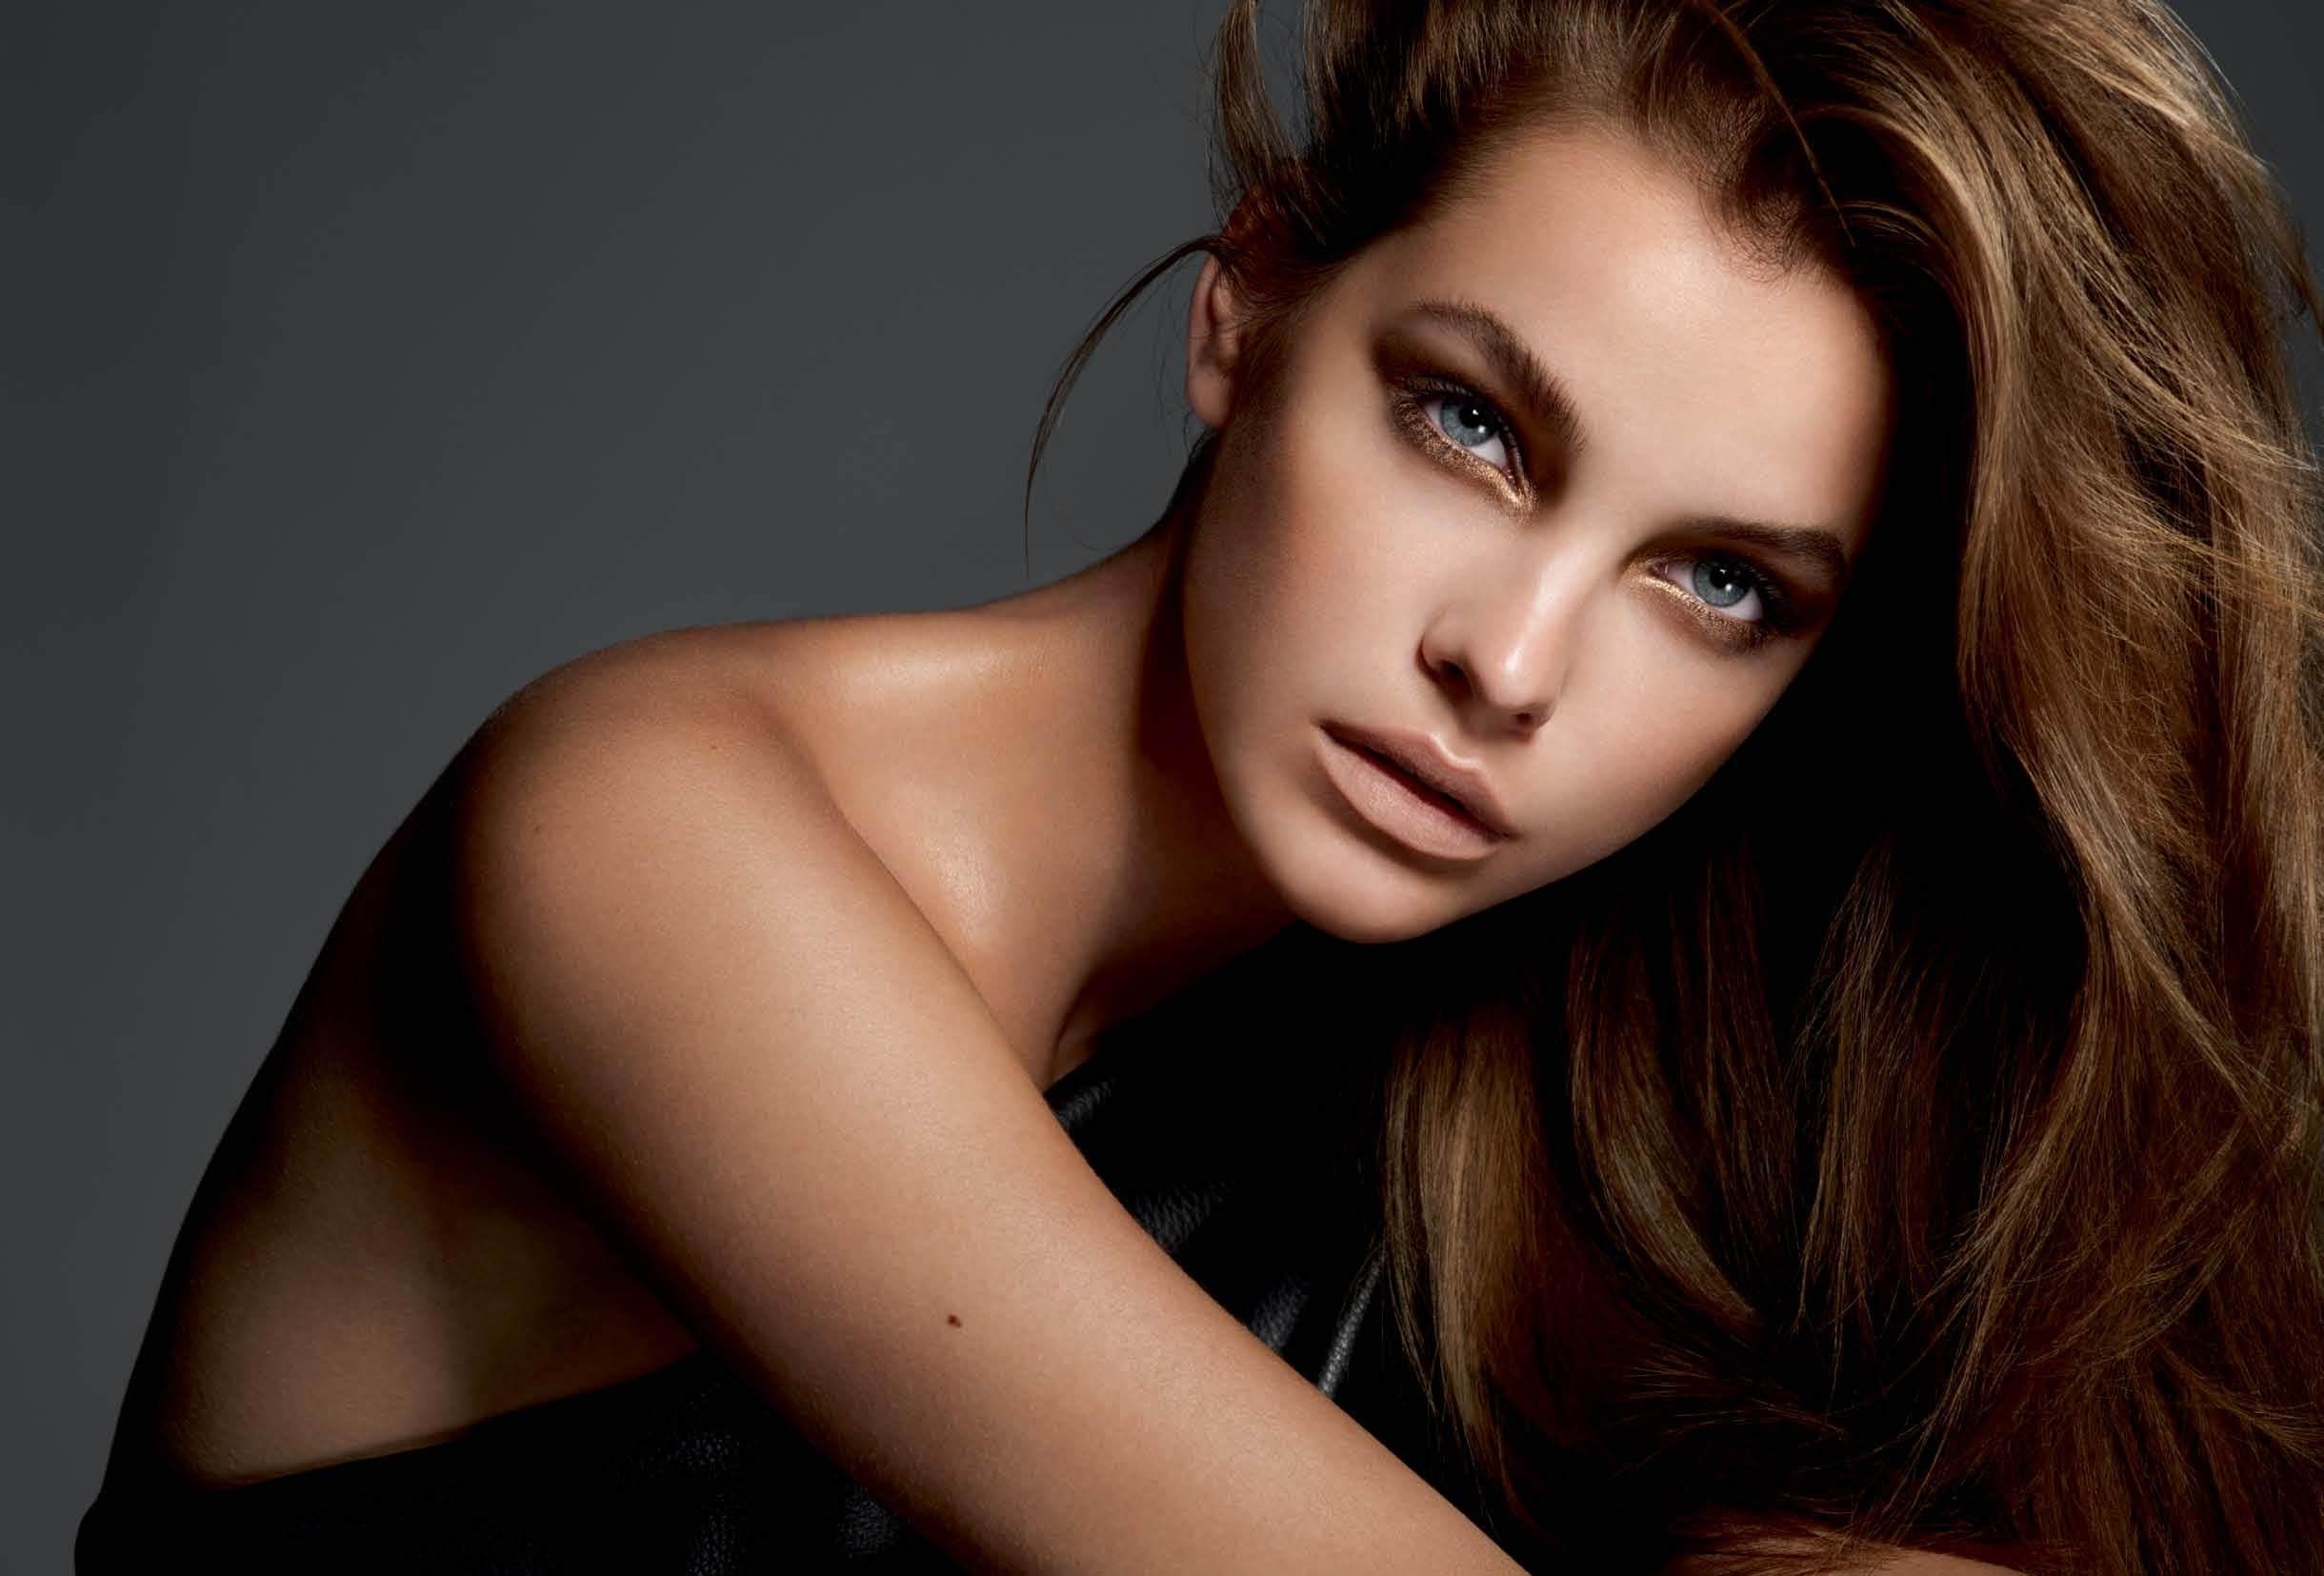 Girl model nude galleries 25